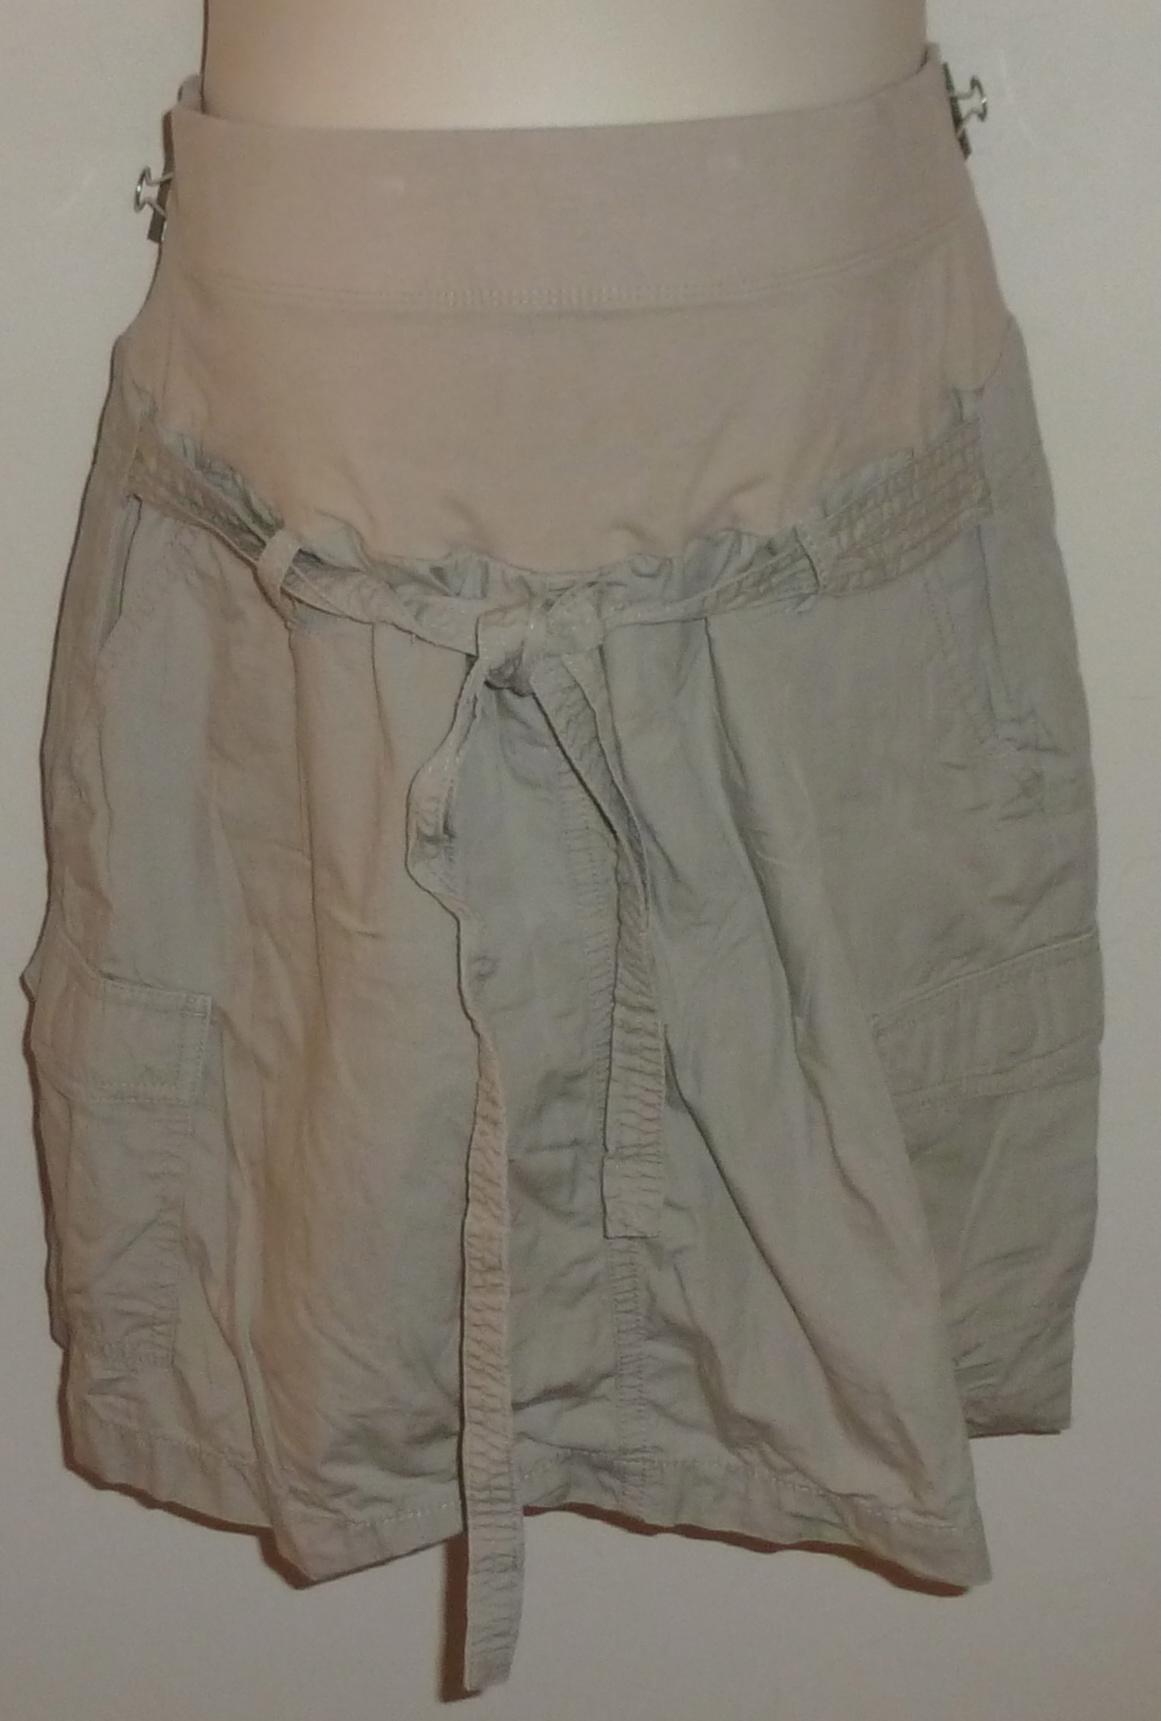 f5d5433ce8e24 Khaki Skirt-Oh Baby By Motherhood Size Medium S713 on Storenvy